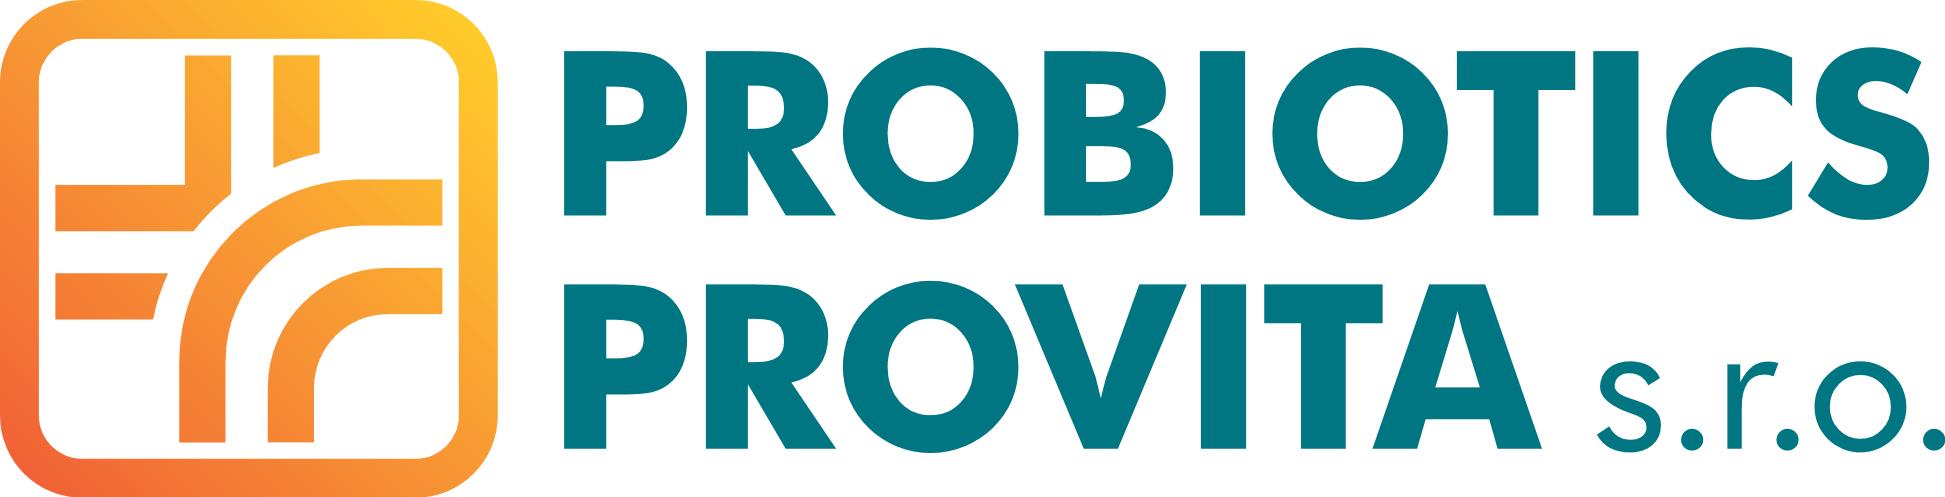 PROBIOTICS PROVITA s.r.o.